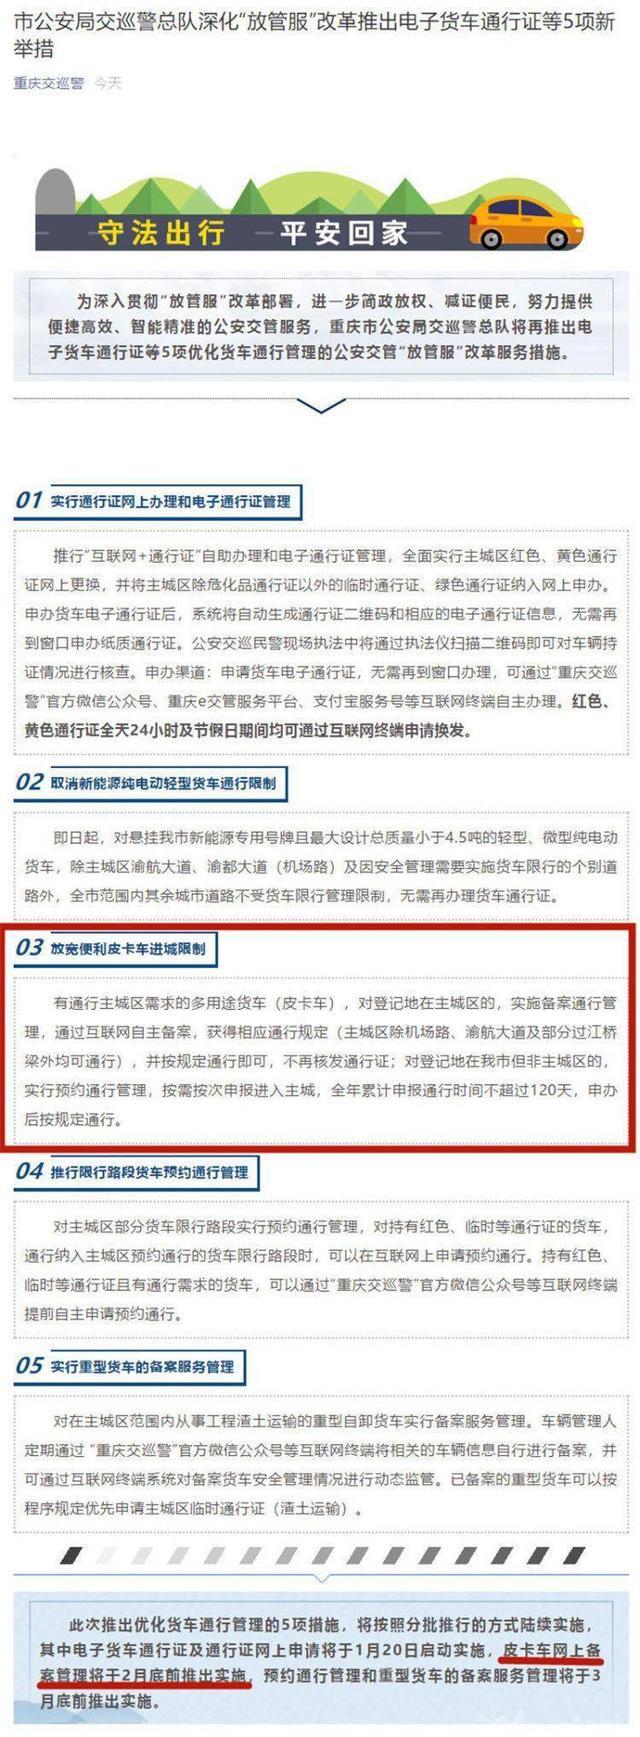 http://www.nowees.com/jiaoyu/1856398.html